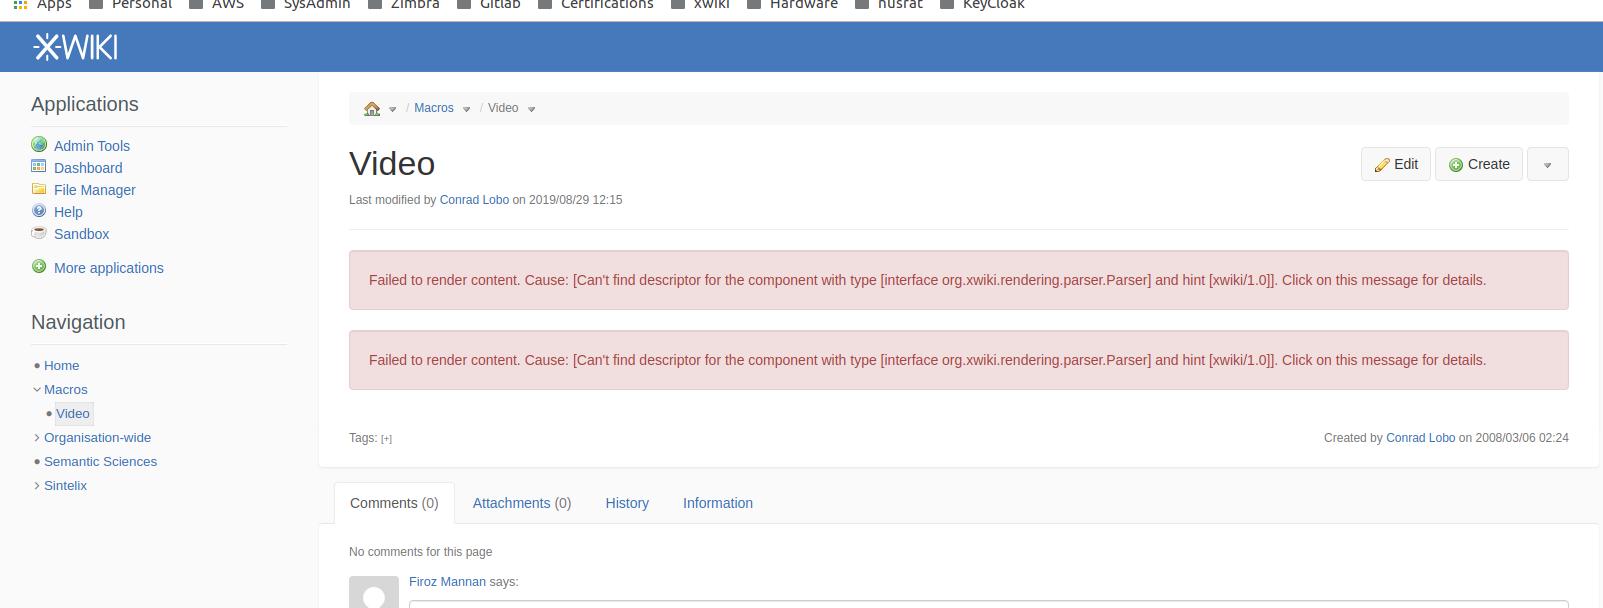 xwiki_video_error